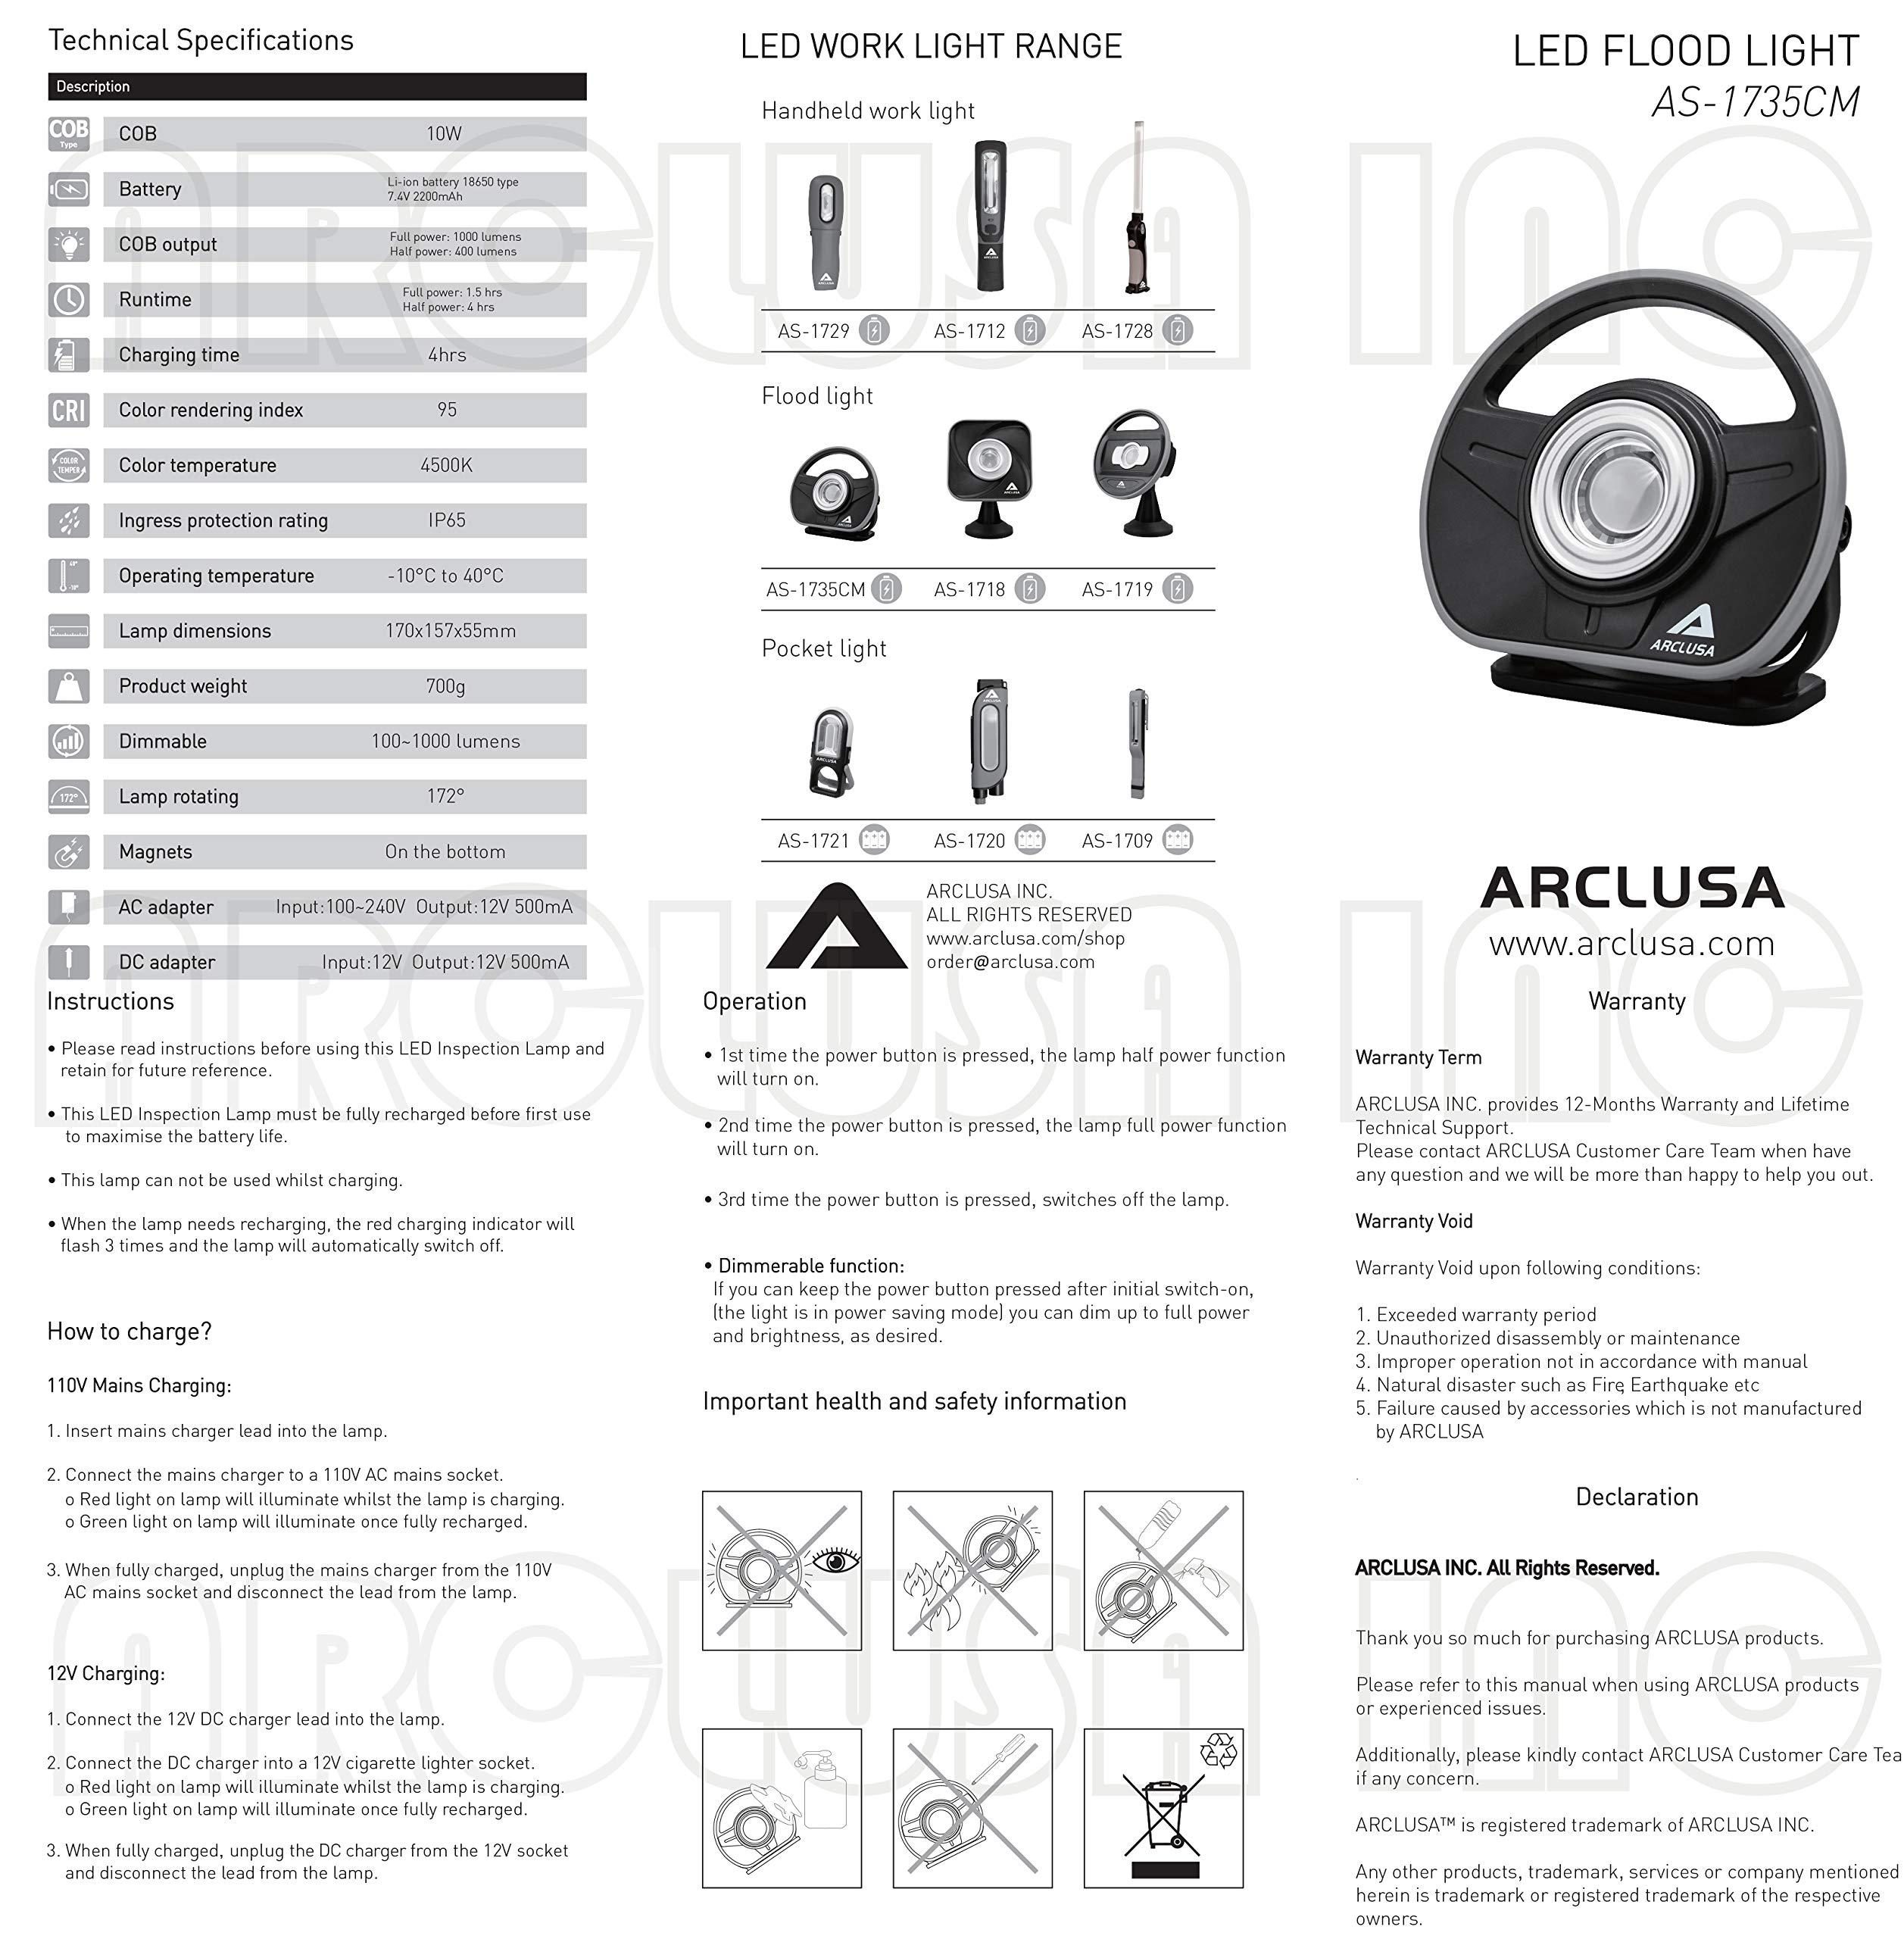 Arclusa COB LED Rechargeable Sunlight Color Match Paint Work Light Adjustable Holder Magnet Bottom Flood Light(1000 Lumen Color Match) by Arclusa (Image #7)